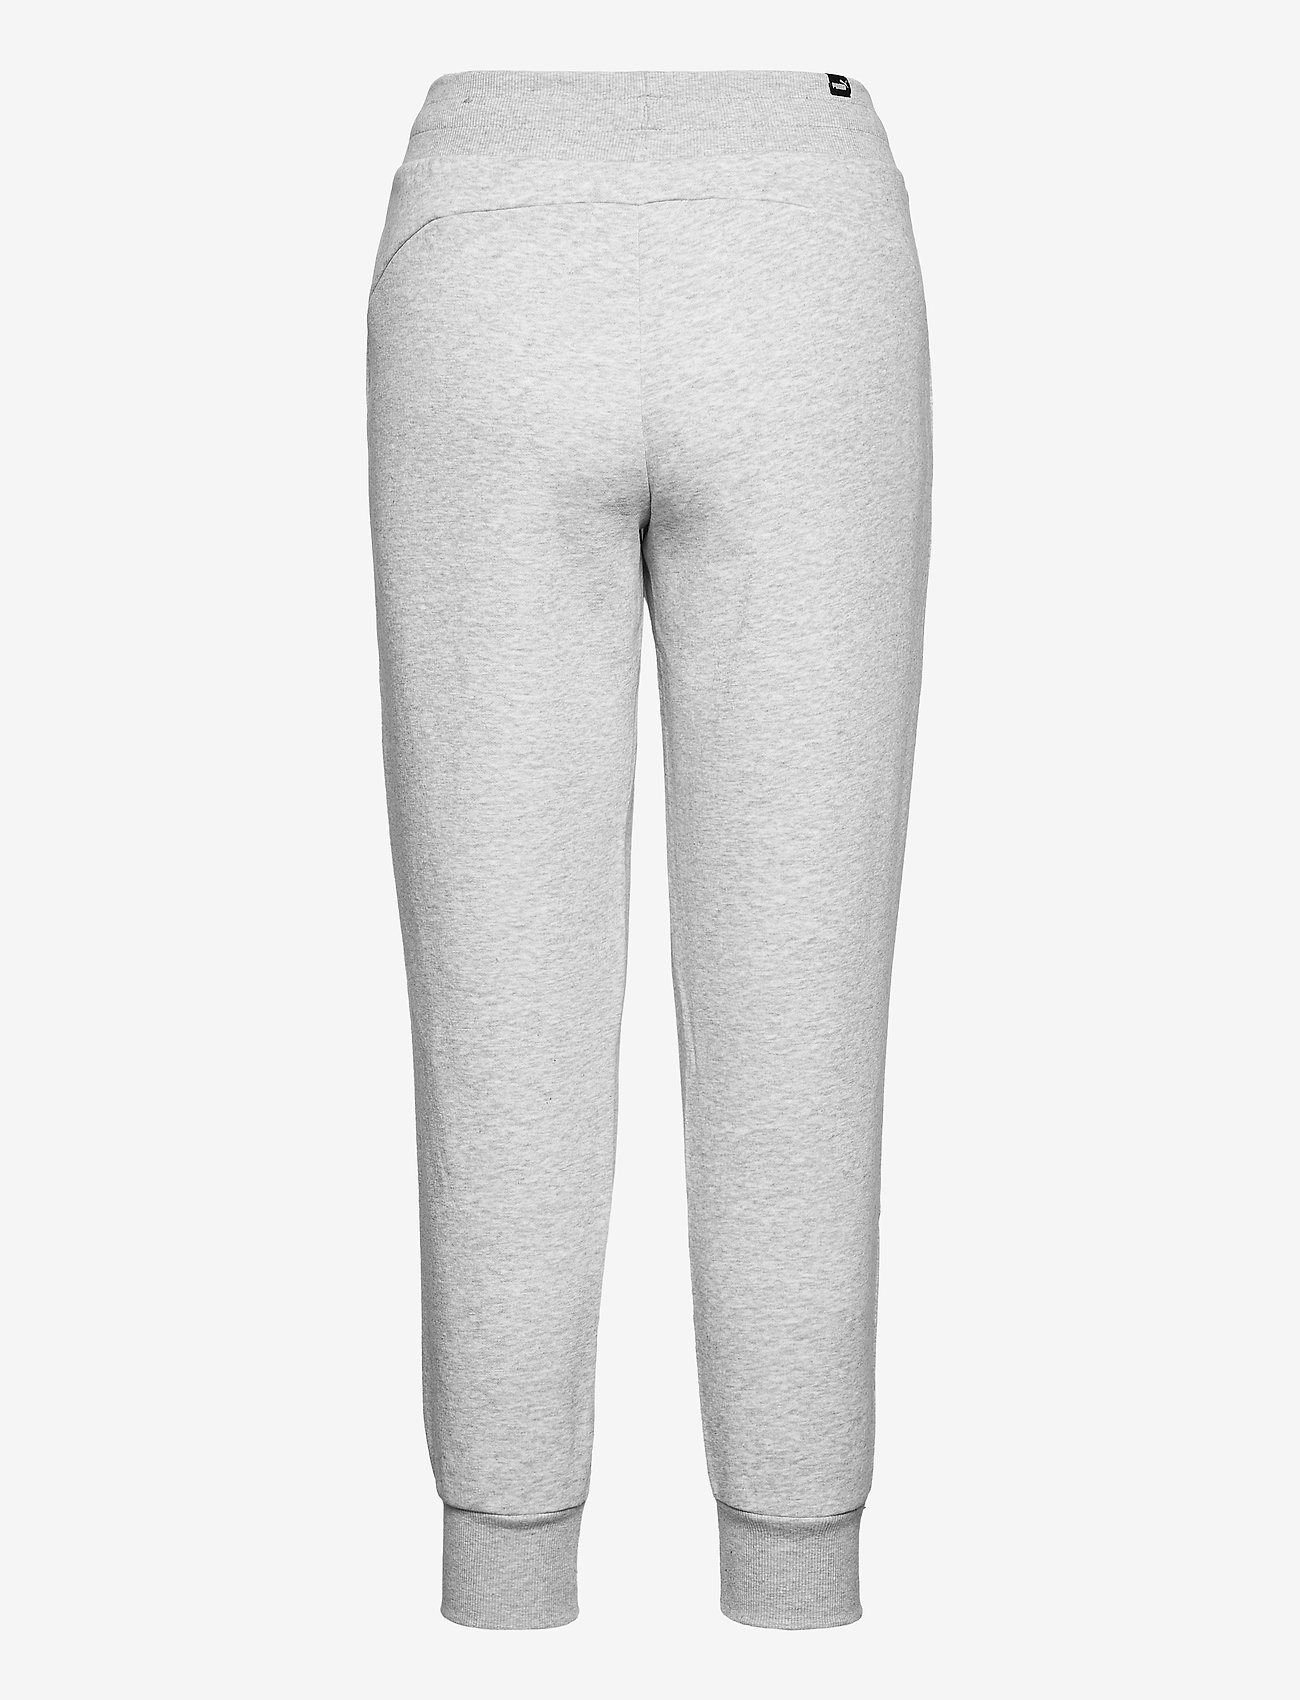 PUMA - ESS Sweatpants FL cl - bukser - light gray heather-cat - 1